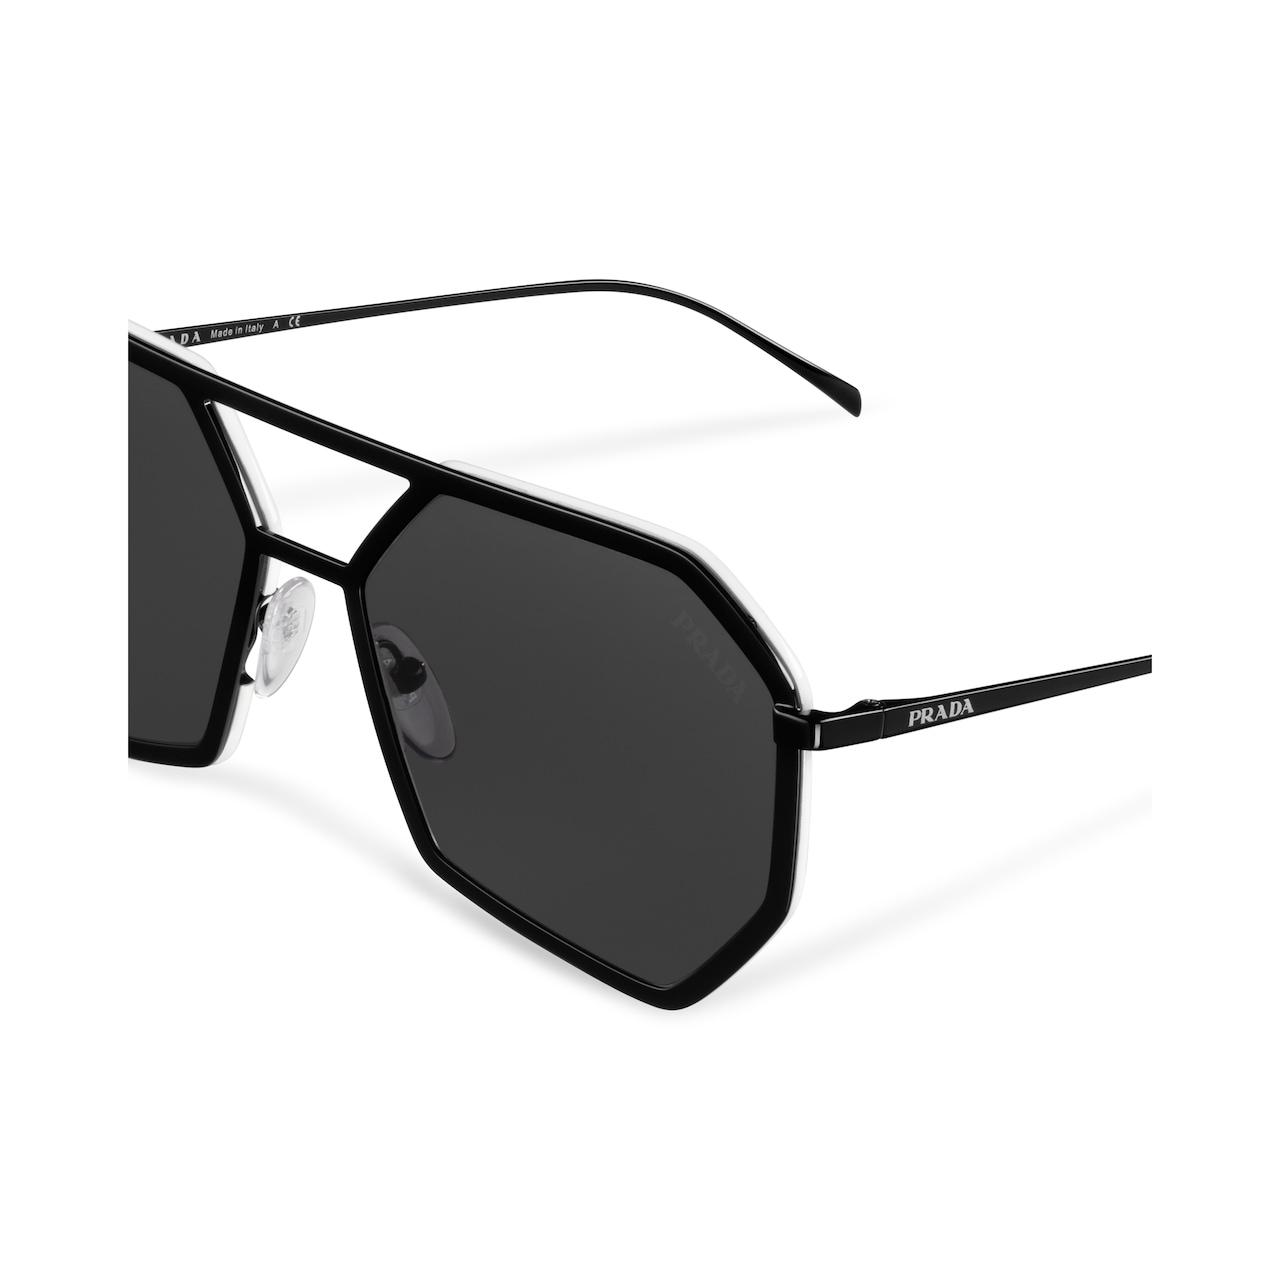 Prada Prada Eyewear 系列太阳镜 5